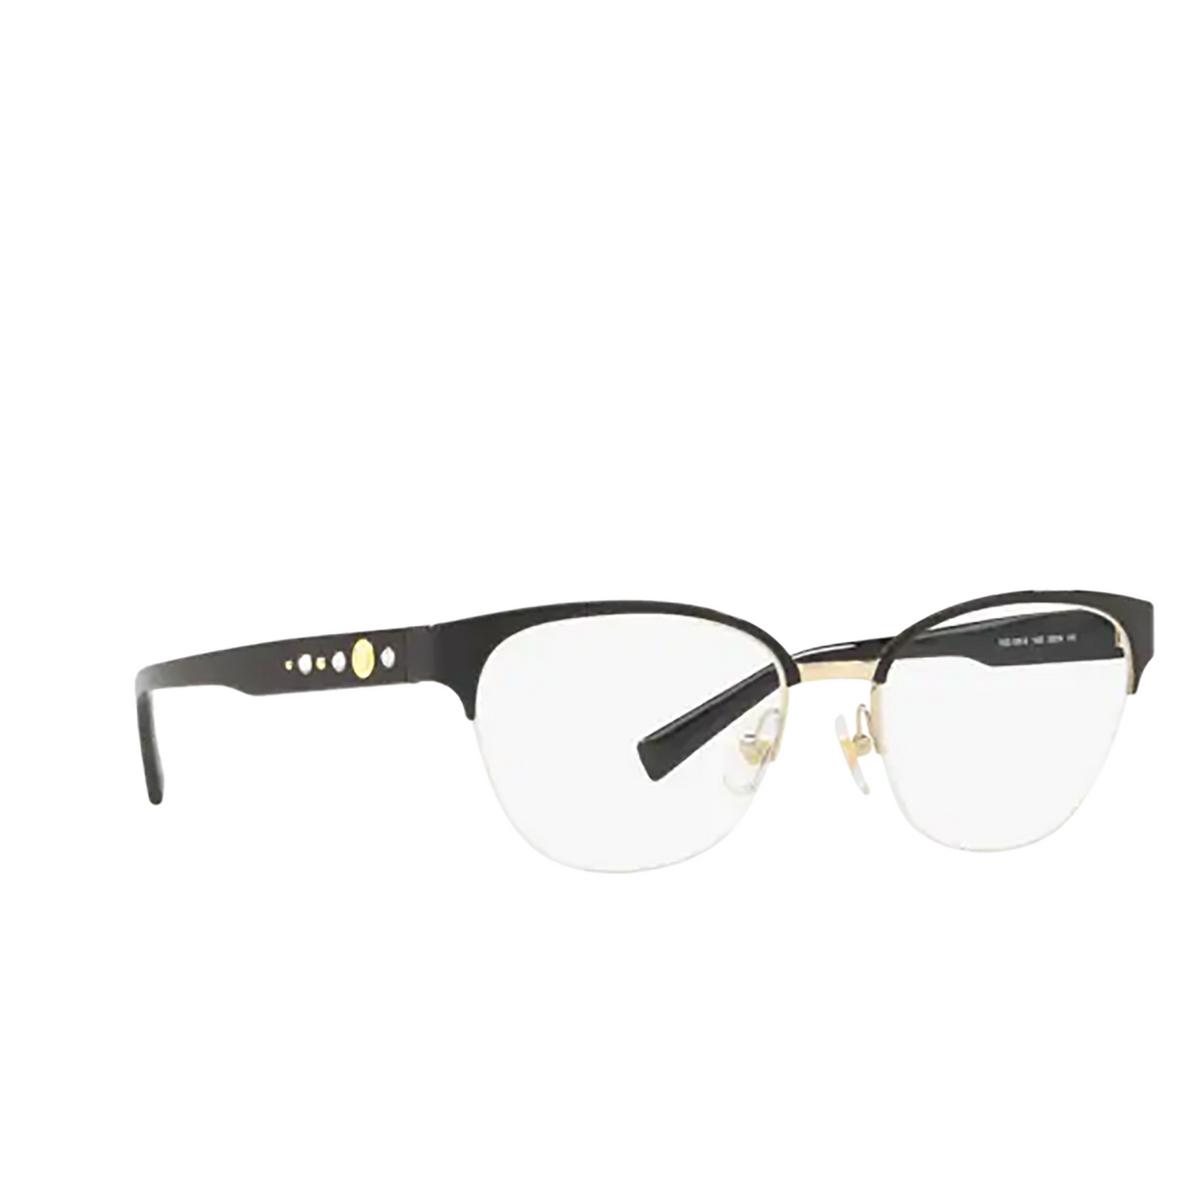 Versace® Butterfly Eyeglasses: VE1255B color Black / Gold 1433.